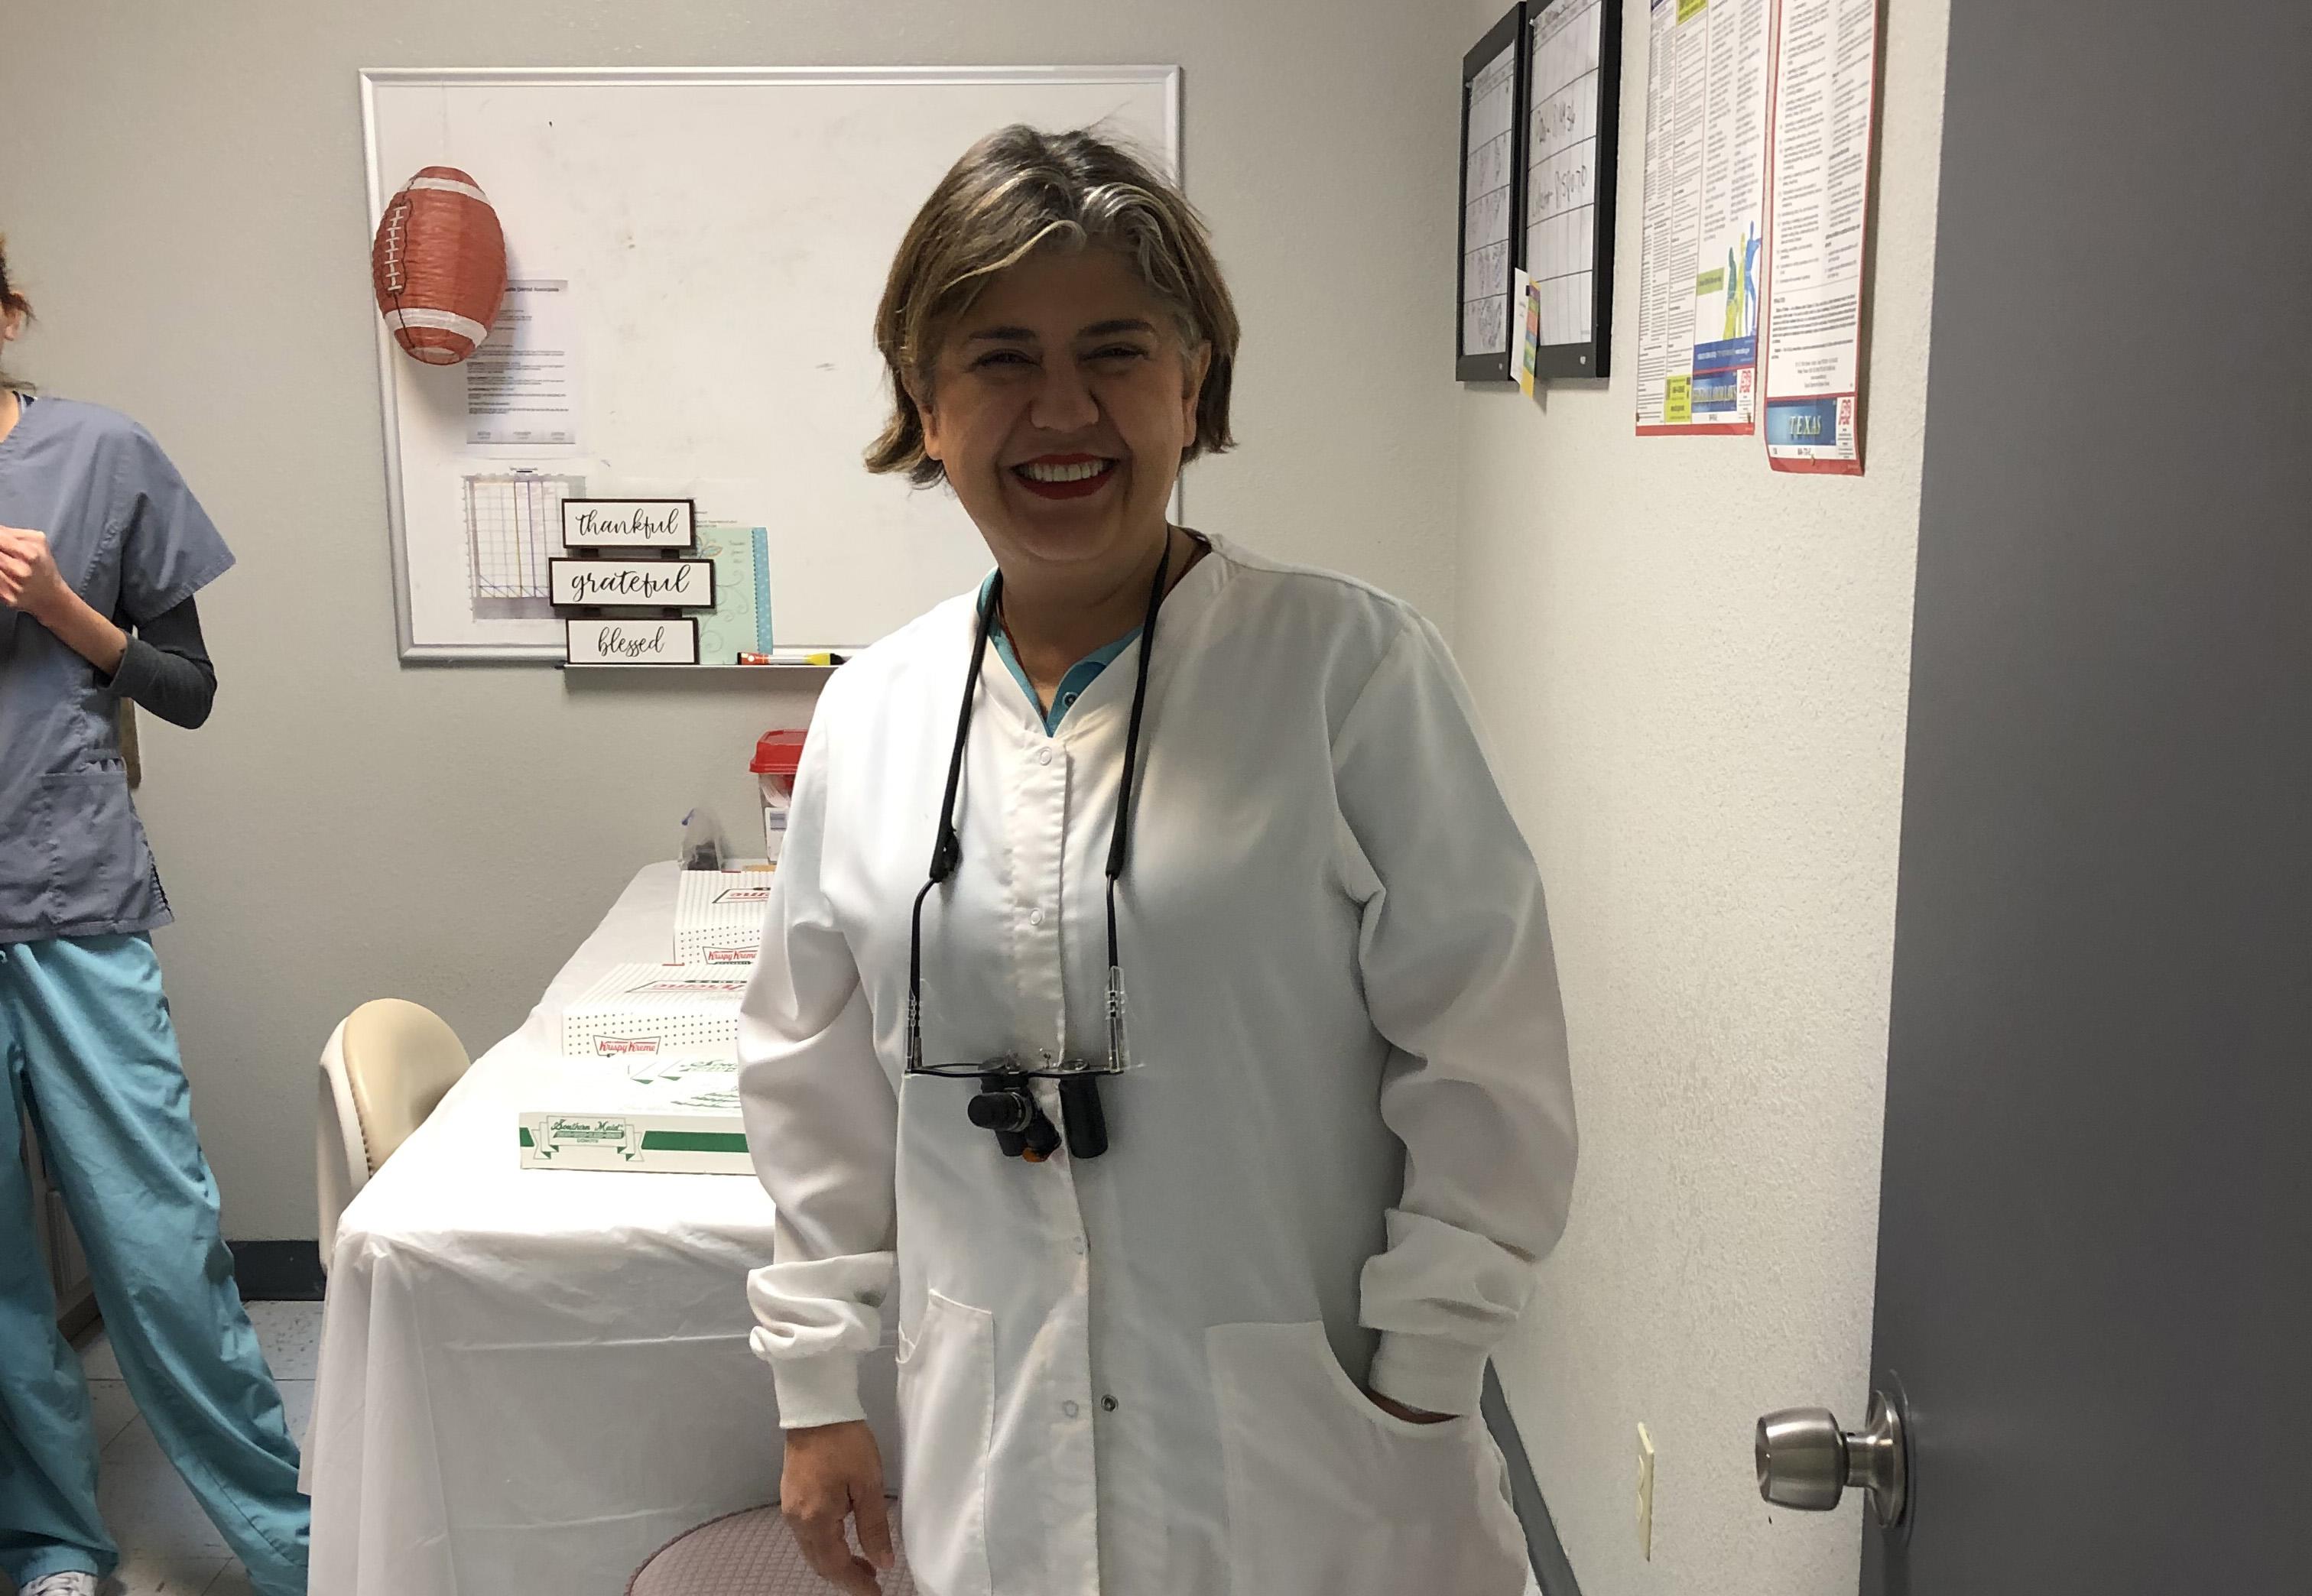 Dental Implants El Paso Concerns in New Local Dentist Interview